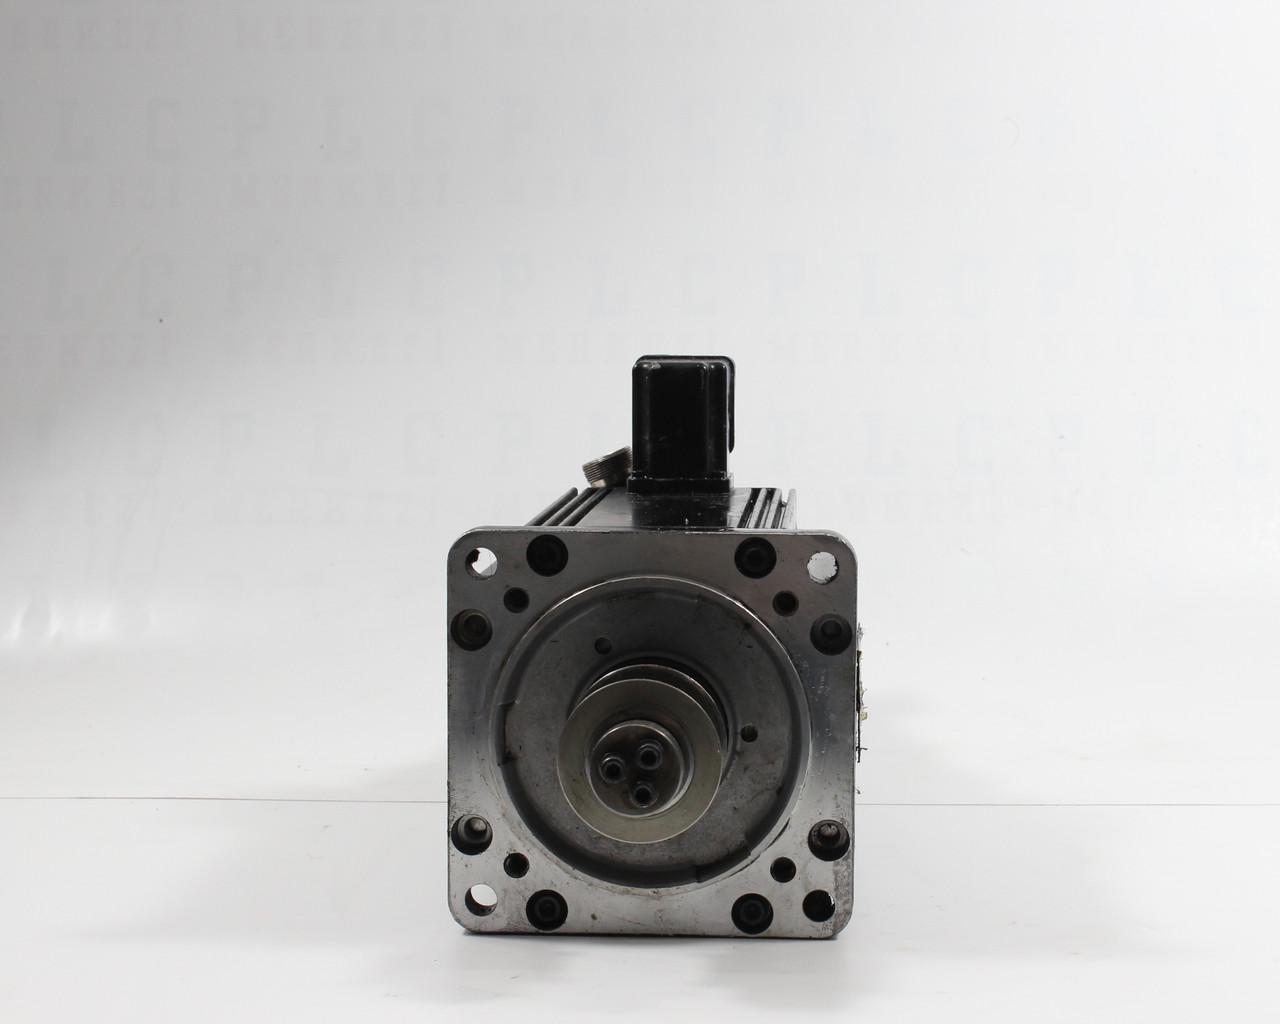 MAC093A-0-LS-4-C/110-B-0/WI524LV SERVOMOTOR INDRAMAT